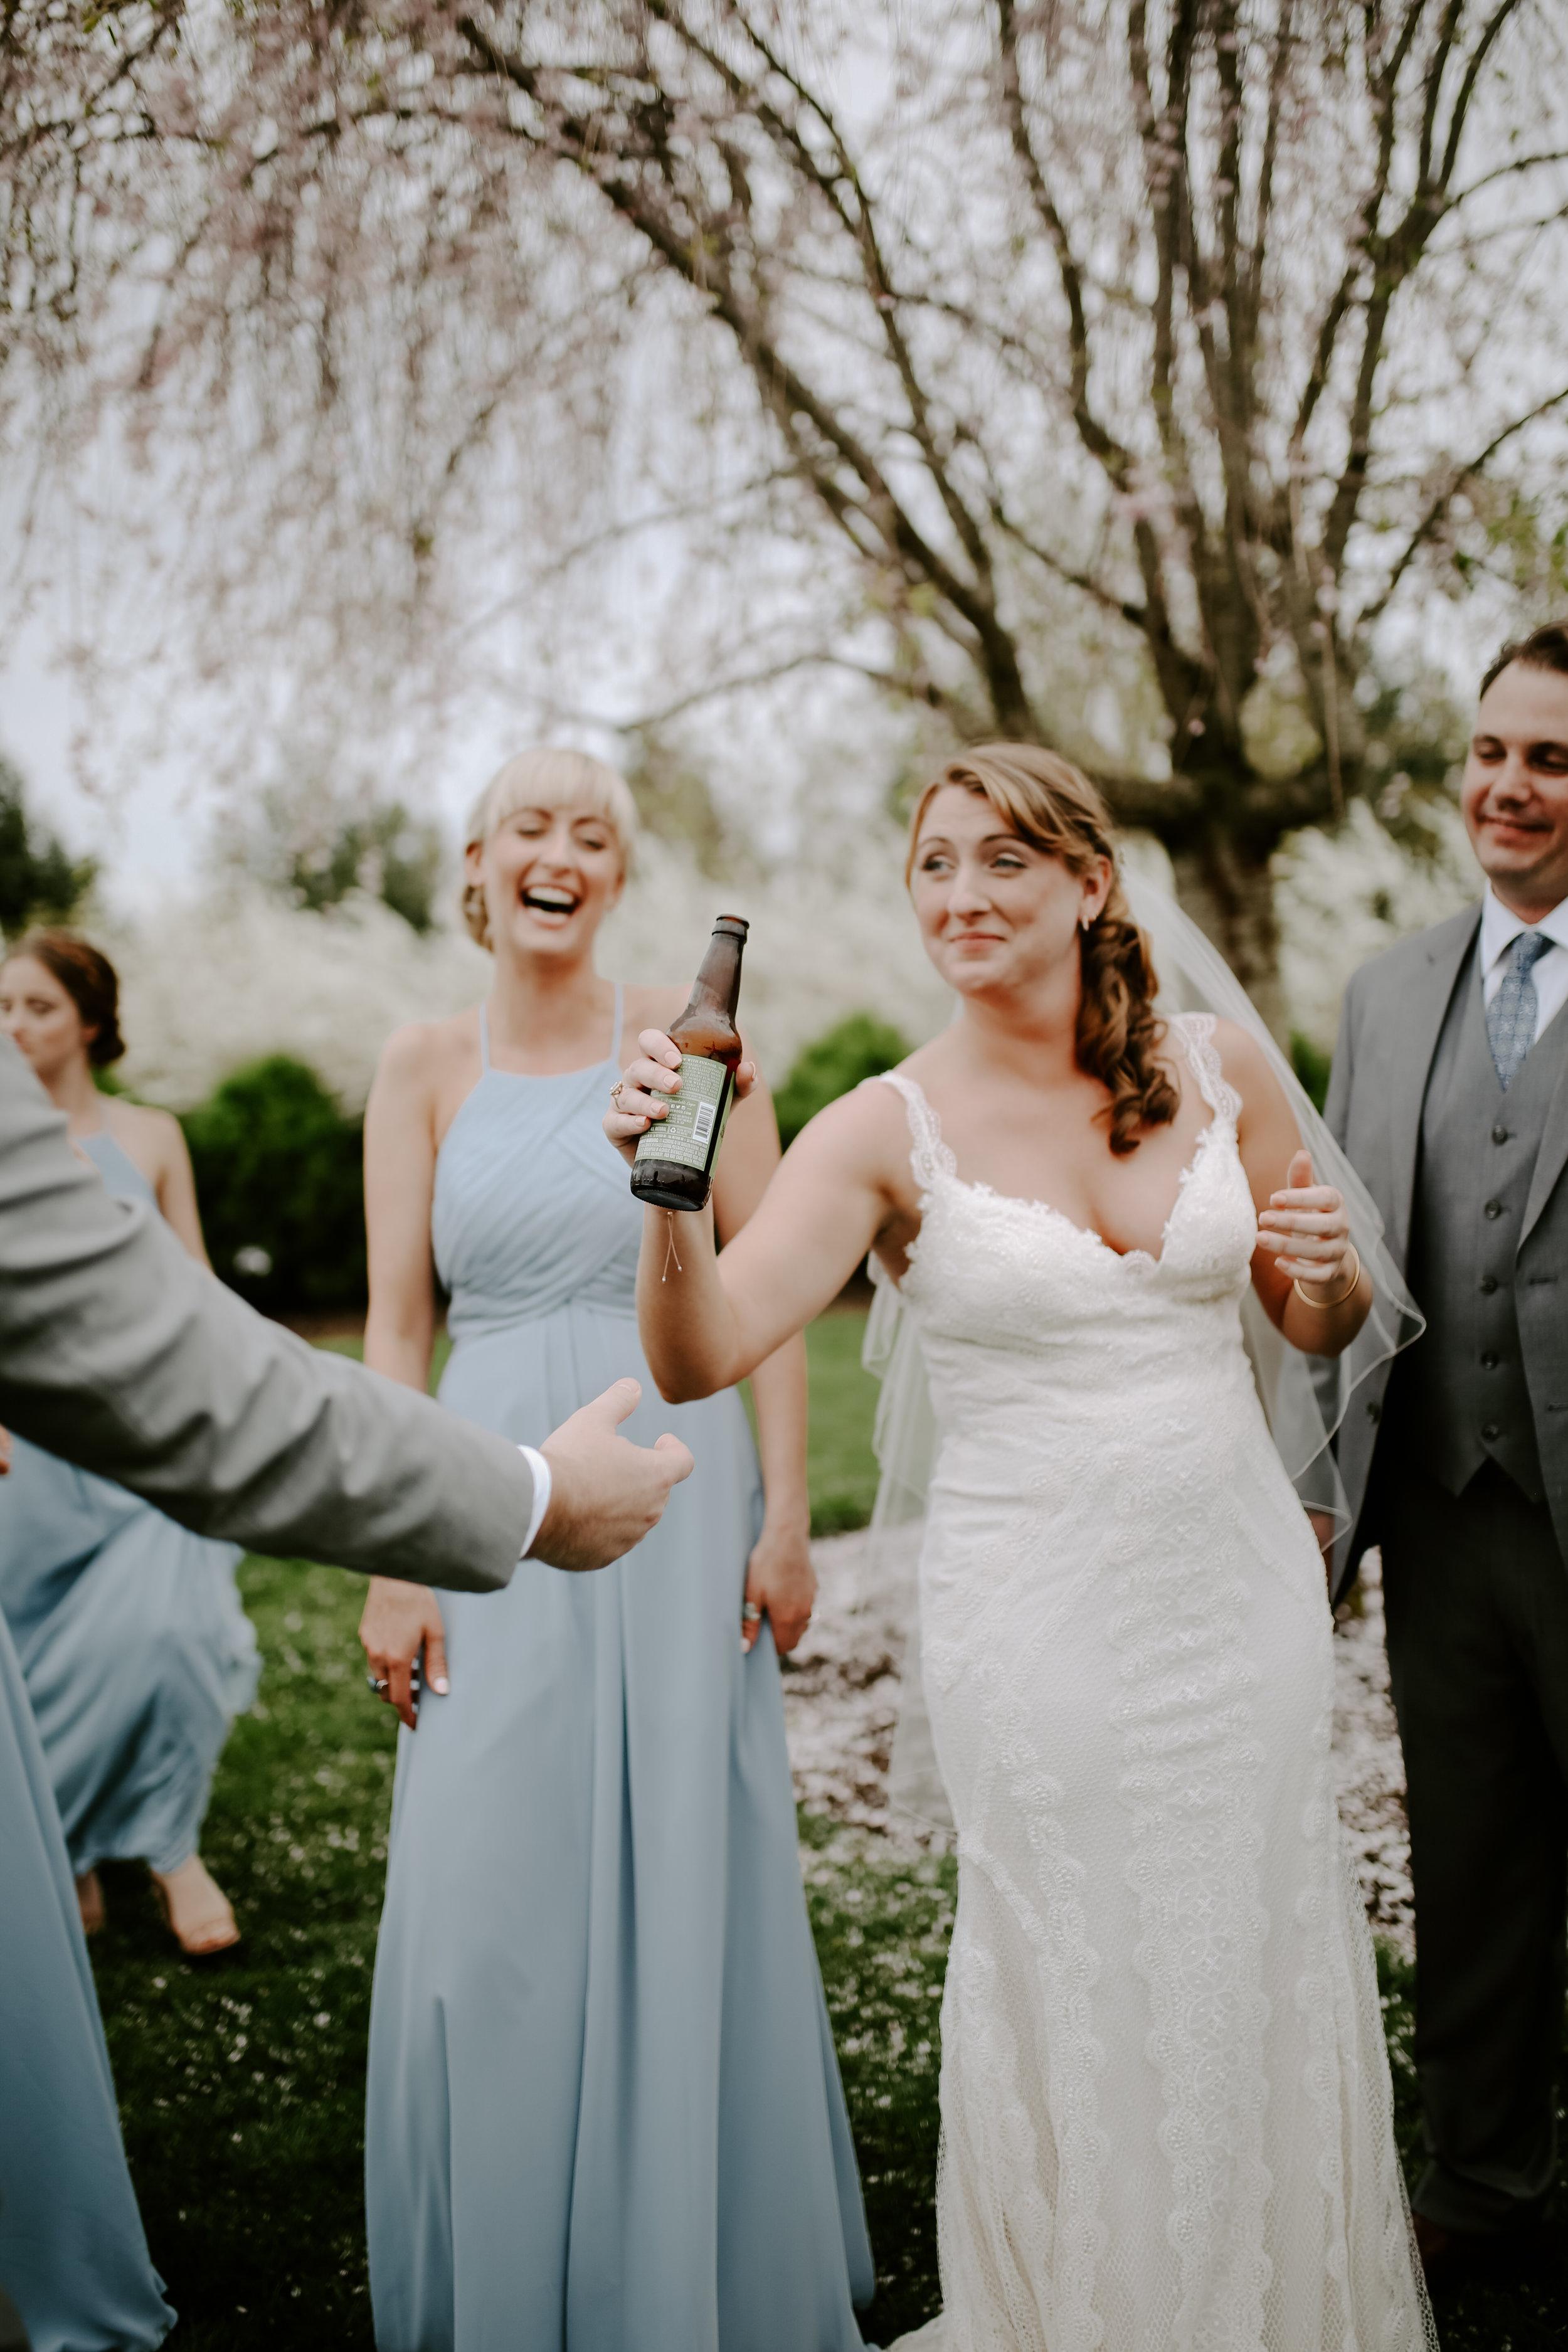 TheGreens_Married_2019-125.jpg